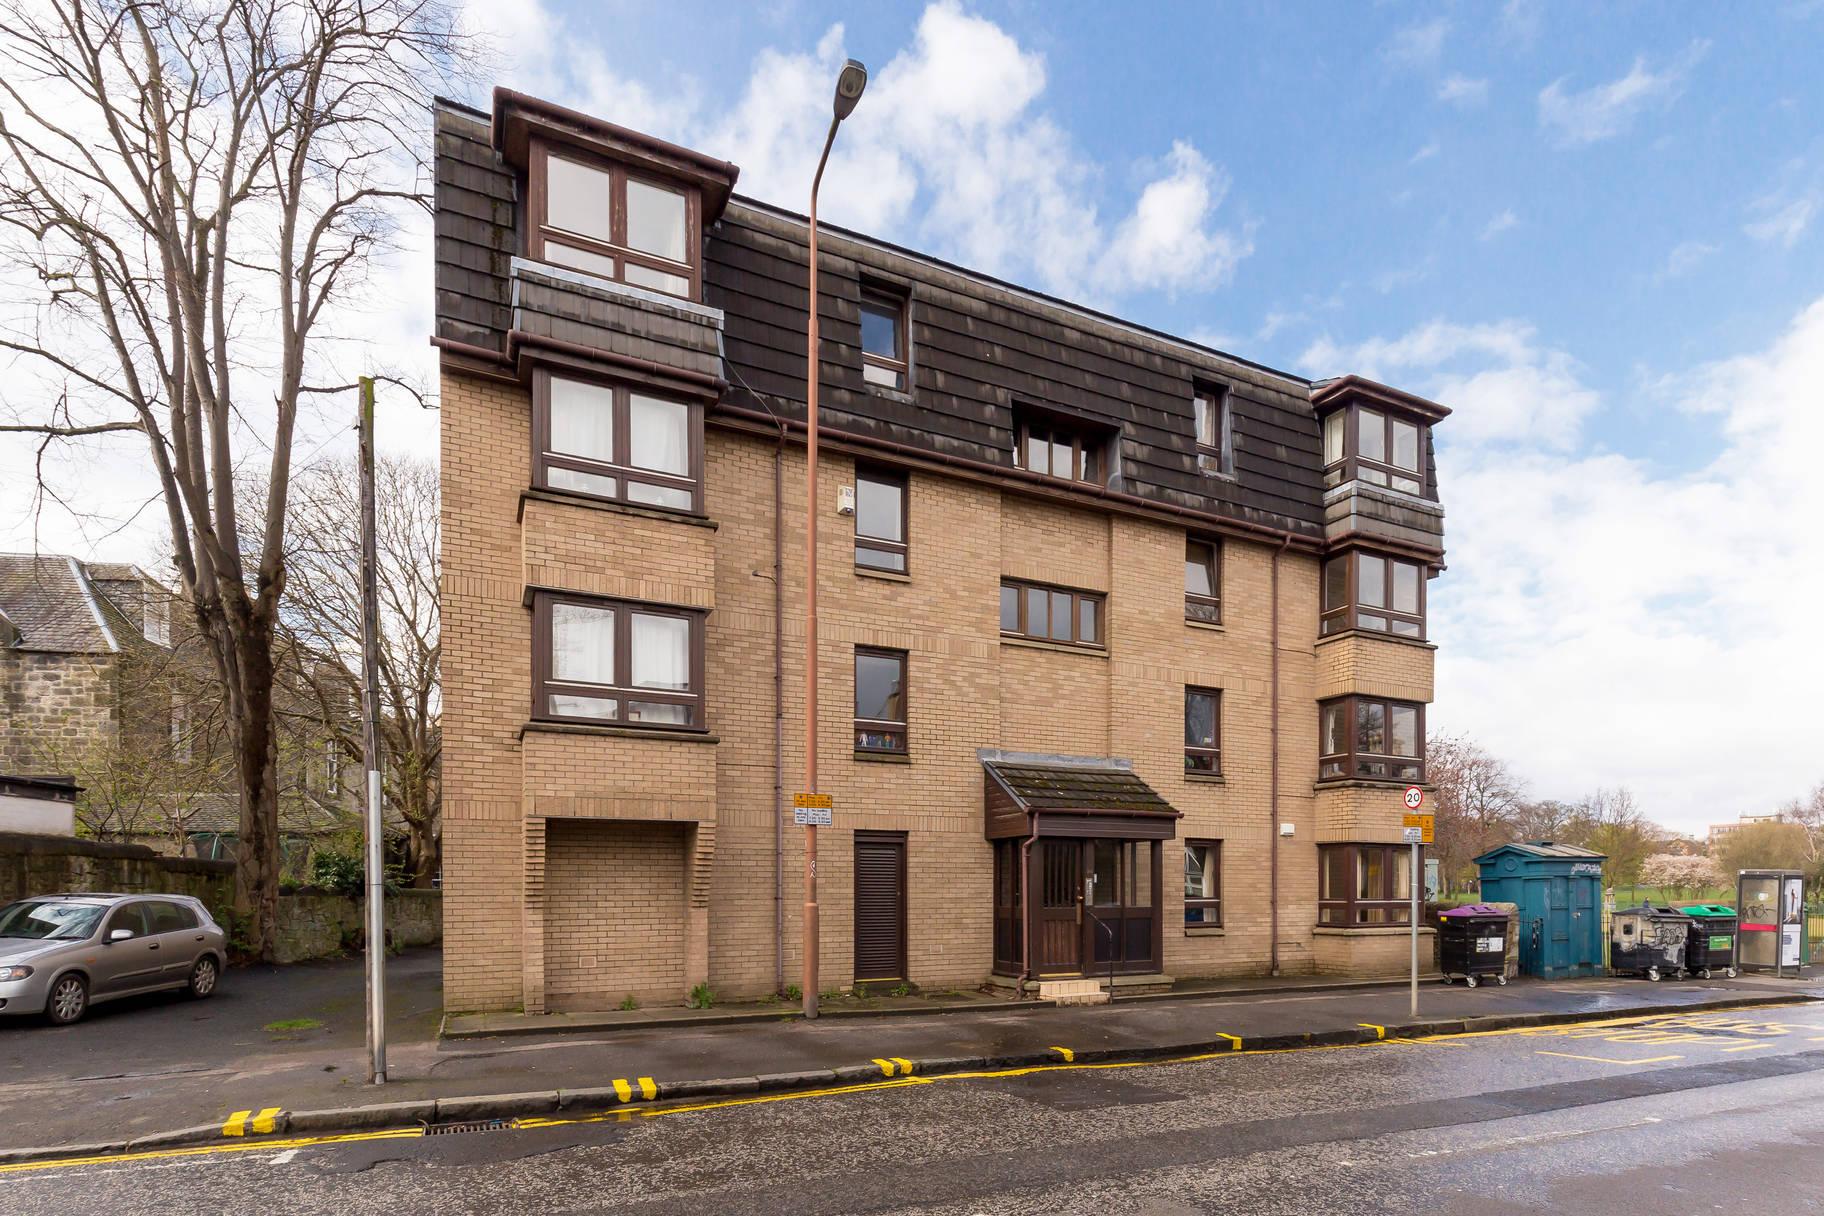 141/1 Newhaven Road, Edinburgh, EH6 4NP